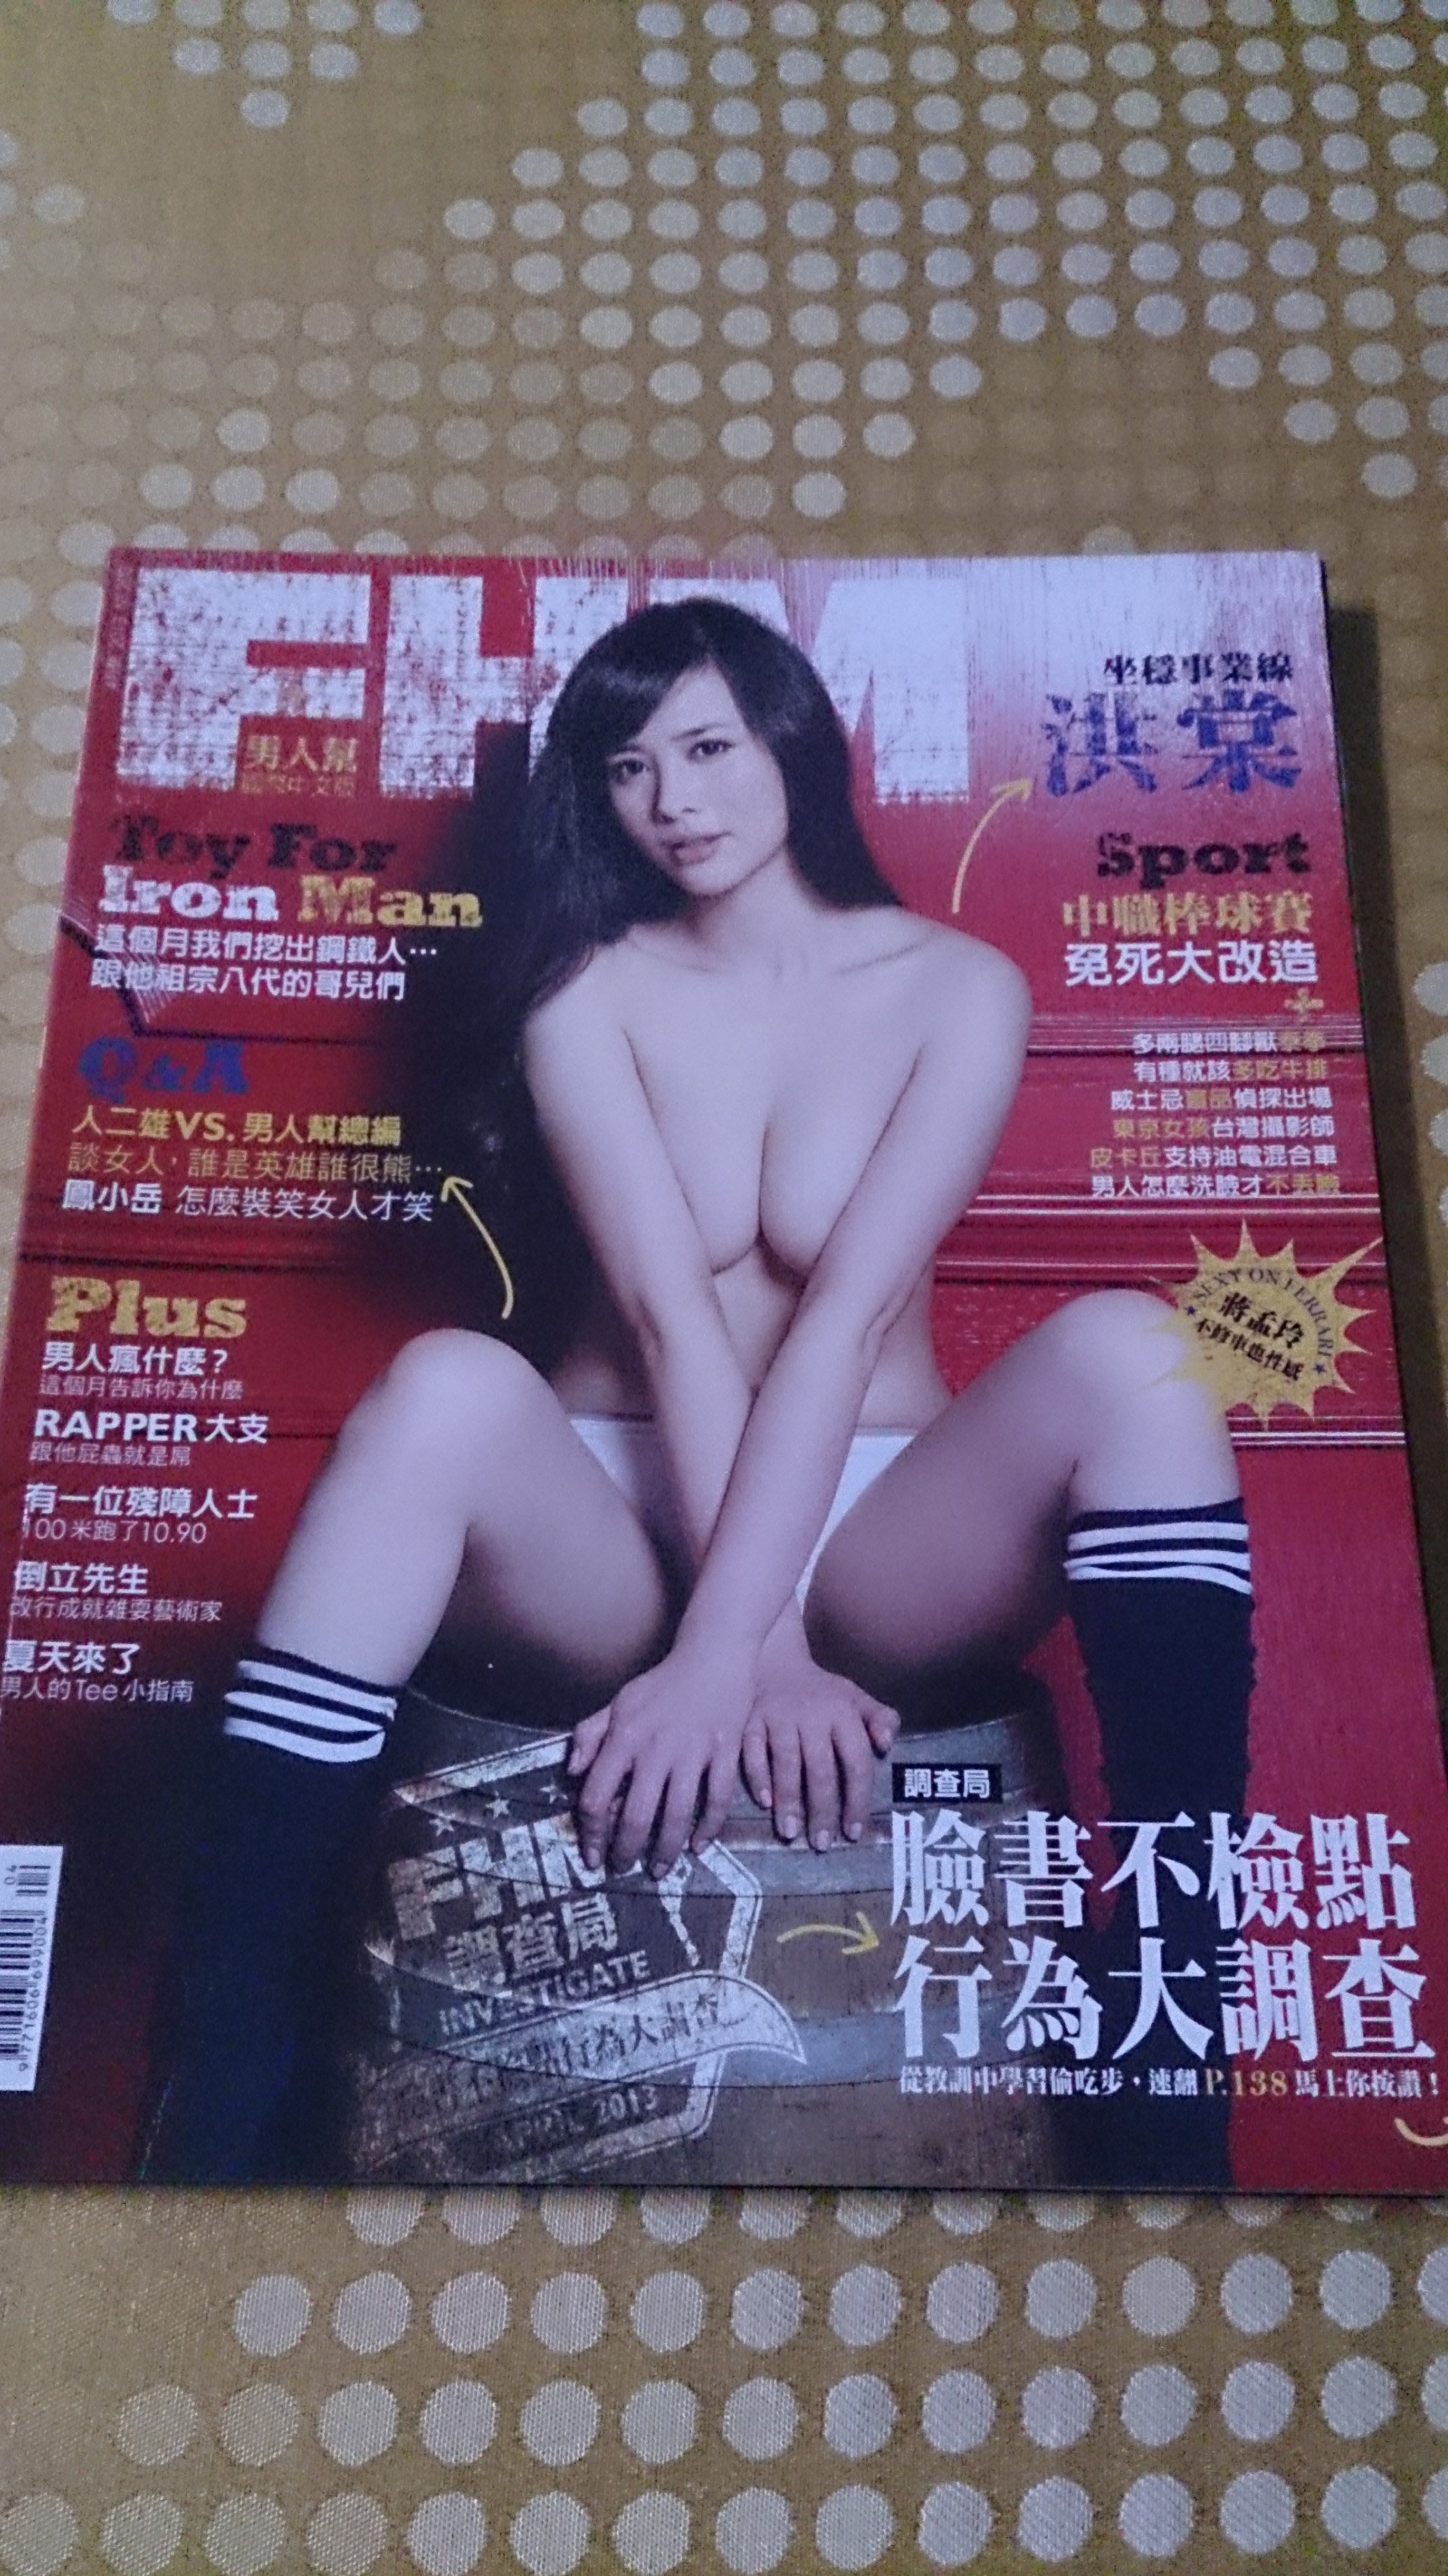 FHM 2013 坐穩事業線 洪棠 不修車也性感 蔣孟玲 皮卡丘支持油電混合車 東京女孩 台灣攝影師